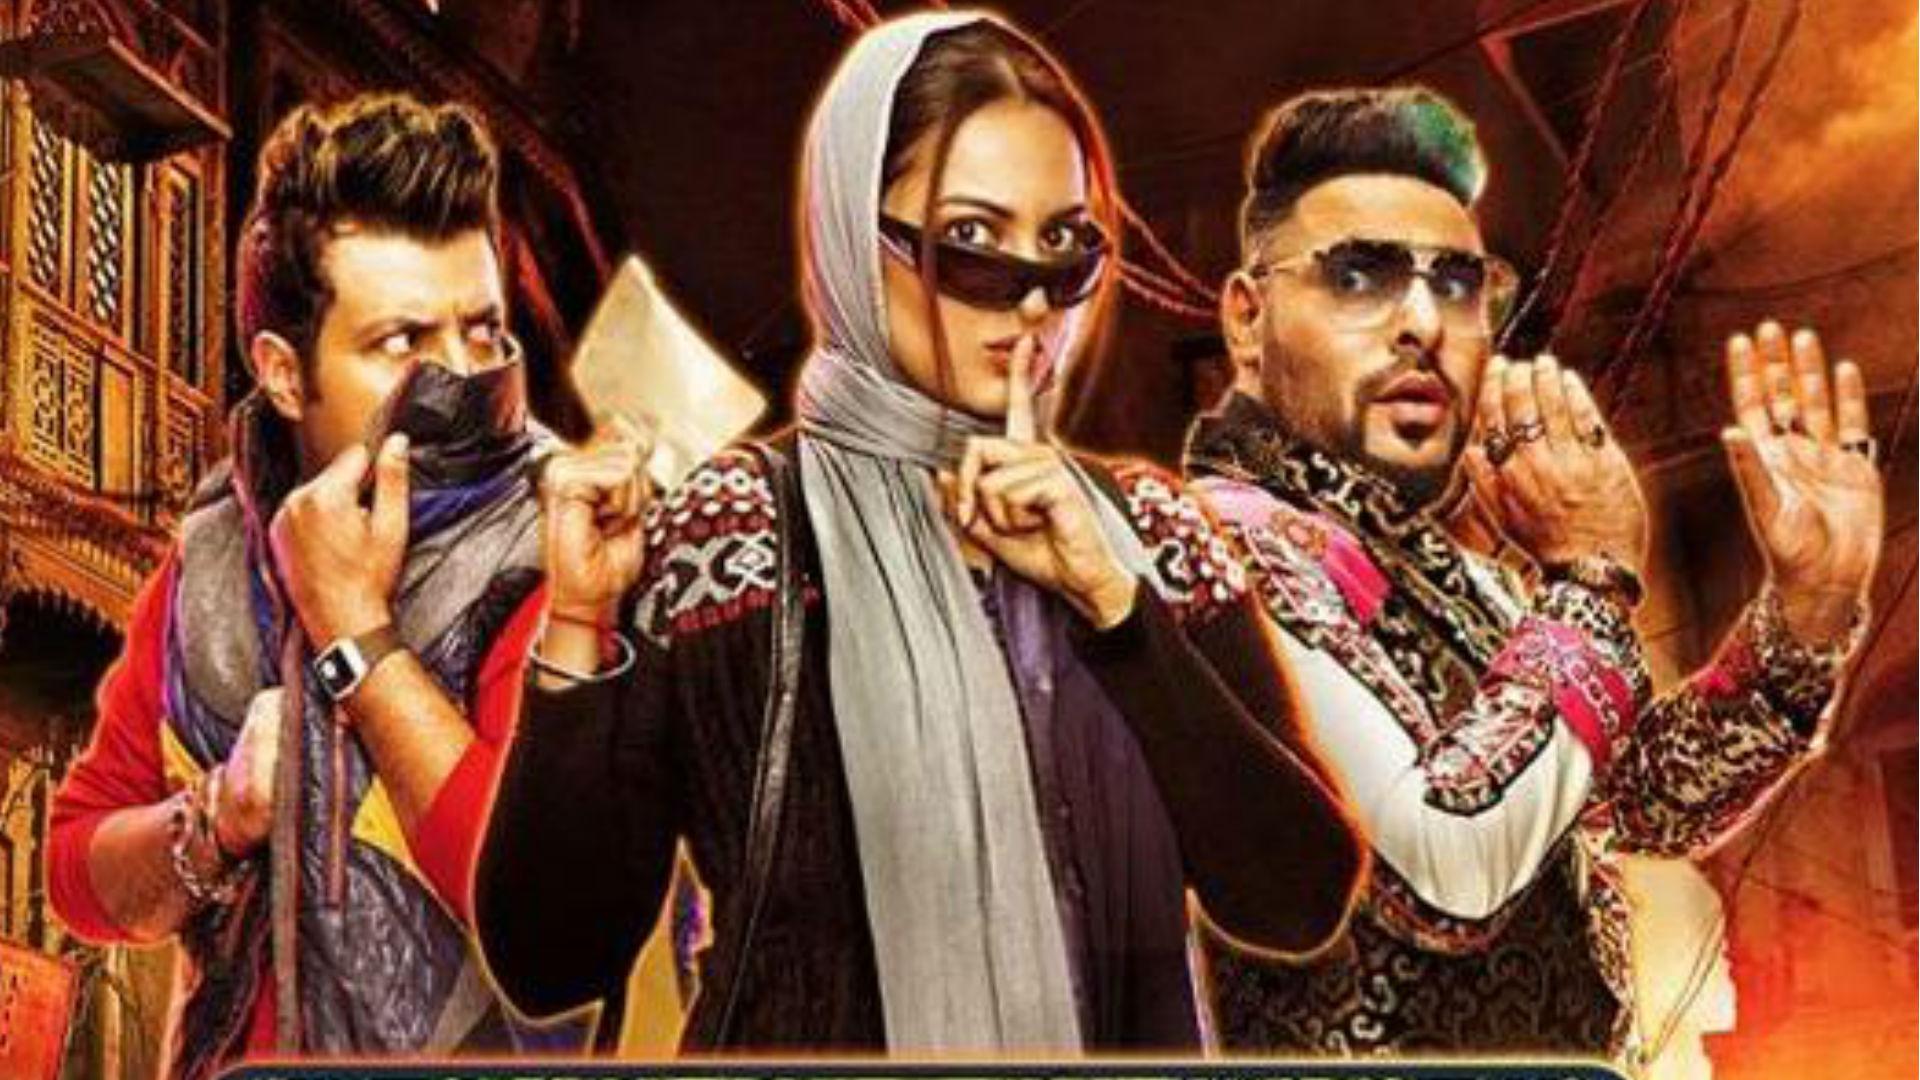 Khandaani Shafakhana Movie: दिल्ली हाईकोर्ट का फरमान- मेकर्स रिलीज से पहले विजय एबॉट को दिखाएं फिल्म